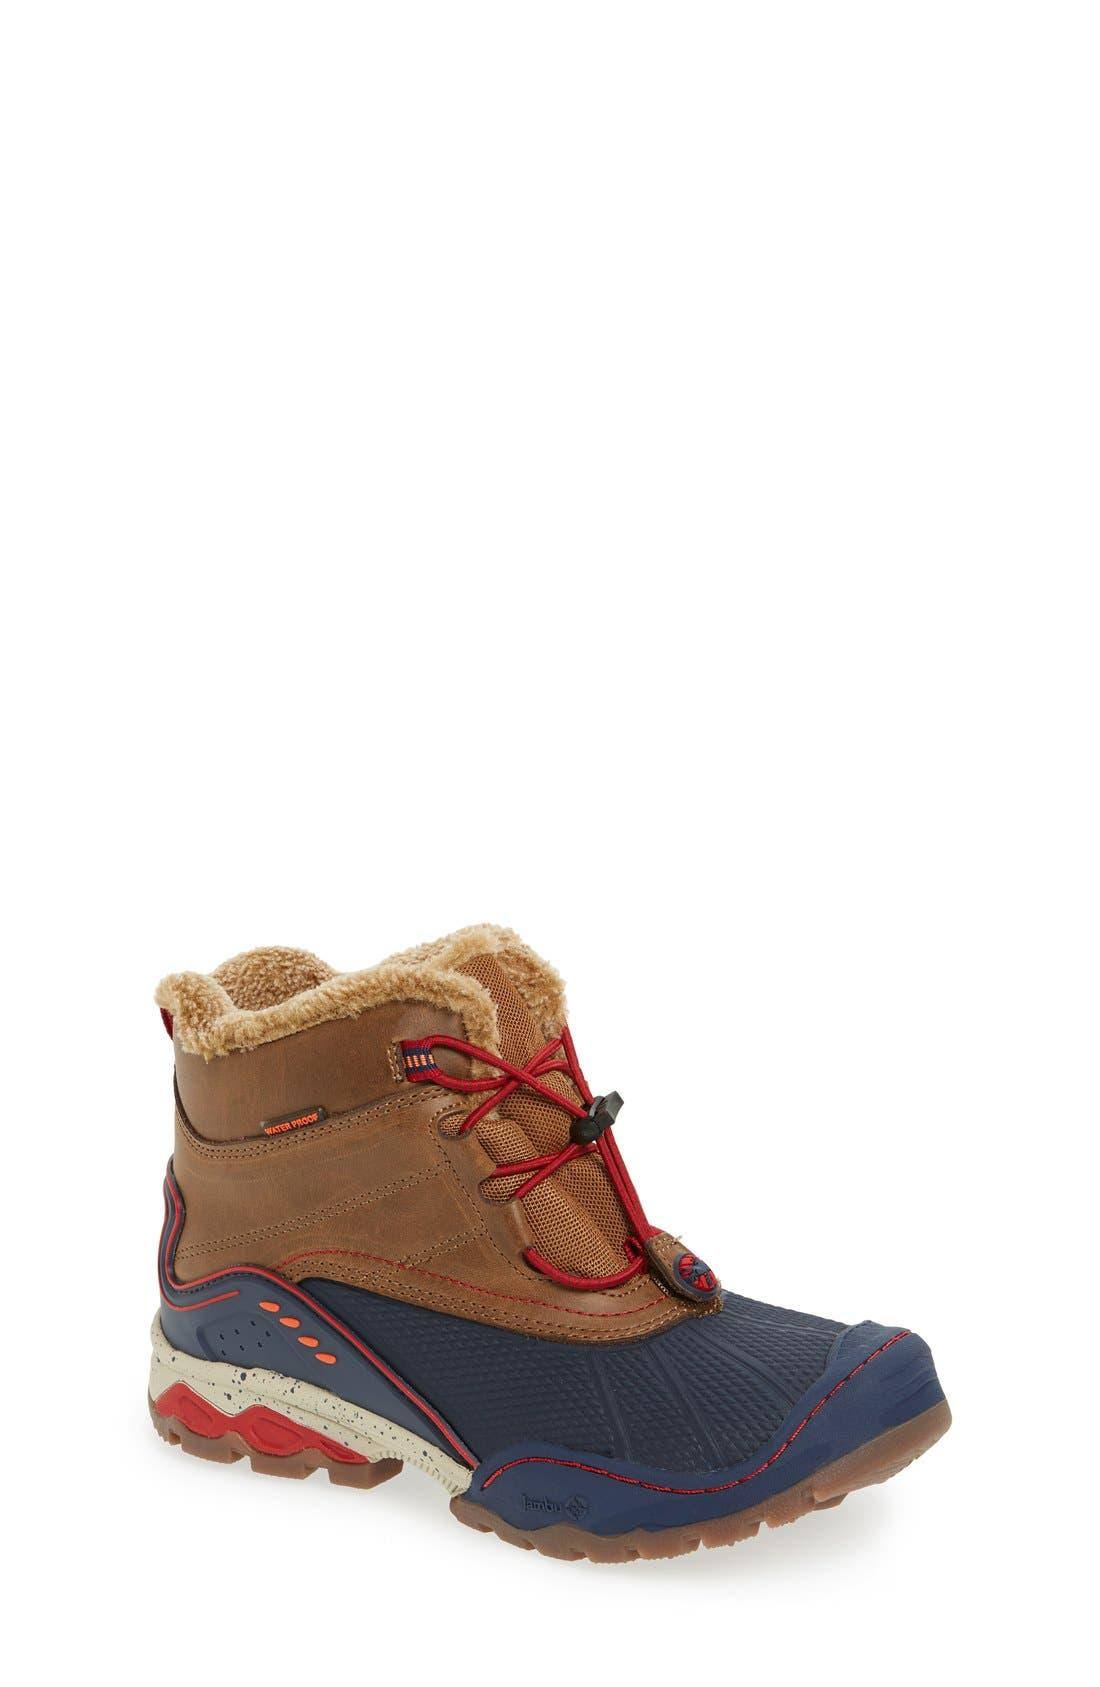 'Baltoro 3' Waterproof Insulated Snow Boot,                             Main thumbnail 1, color,                             BROWN/ NAVY